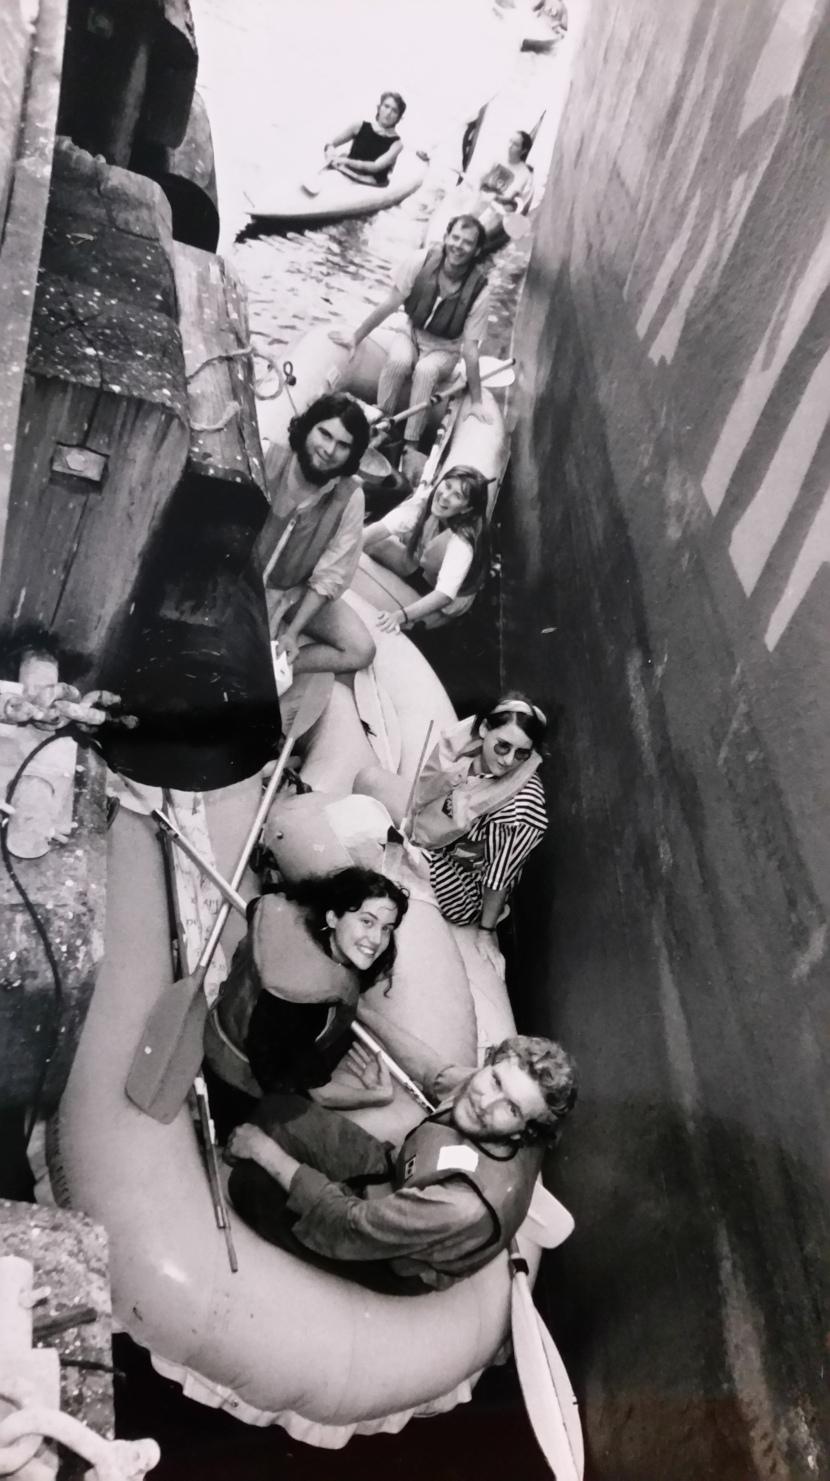 Nonviolent activists from MRAG, SRAG & BRAG blockade the rainforest timber ship 'Mayfair' in Darling Harbour, Sydney, 19 February 1990.